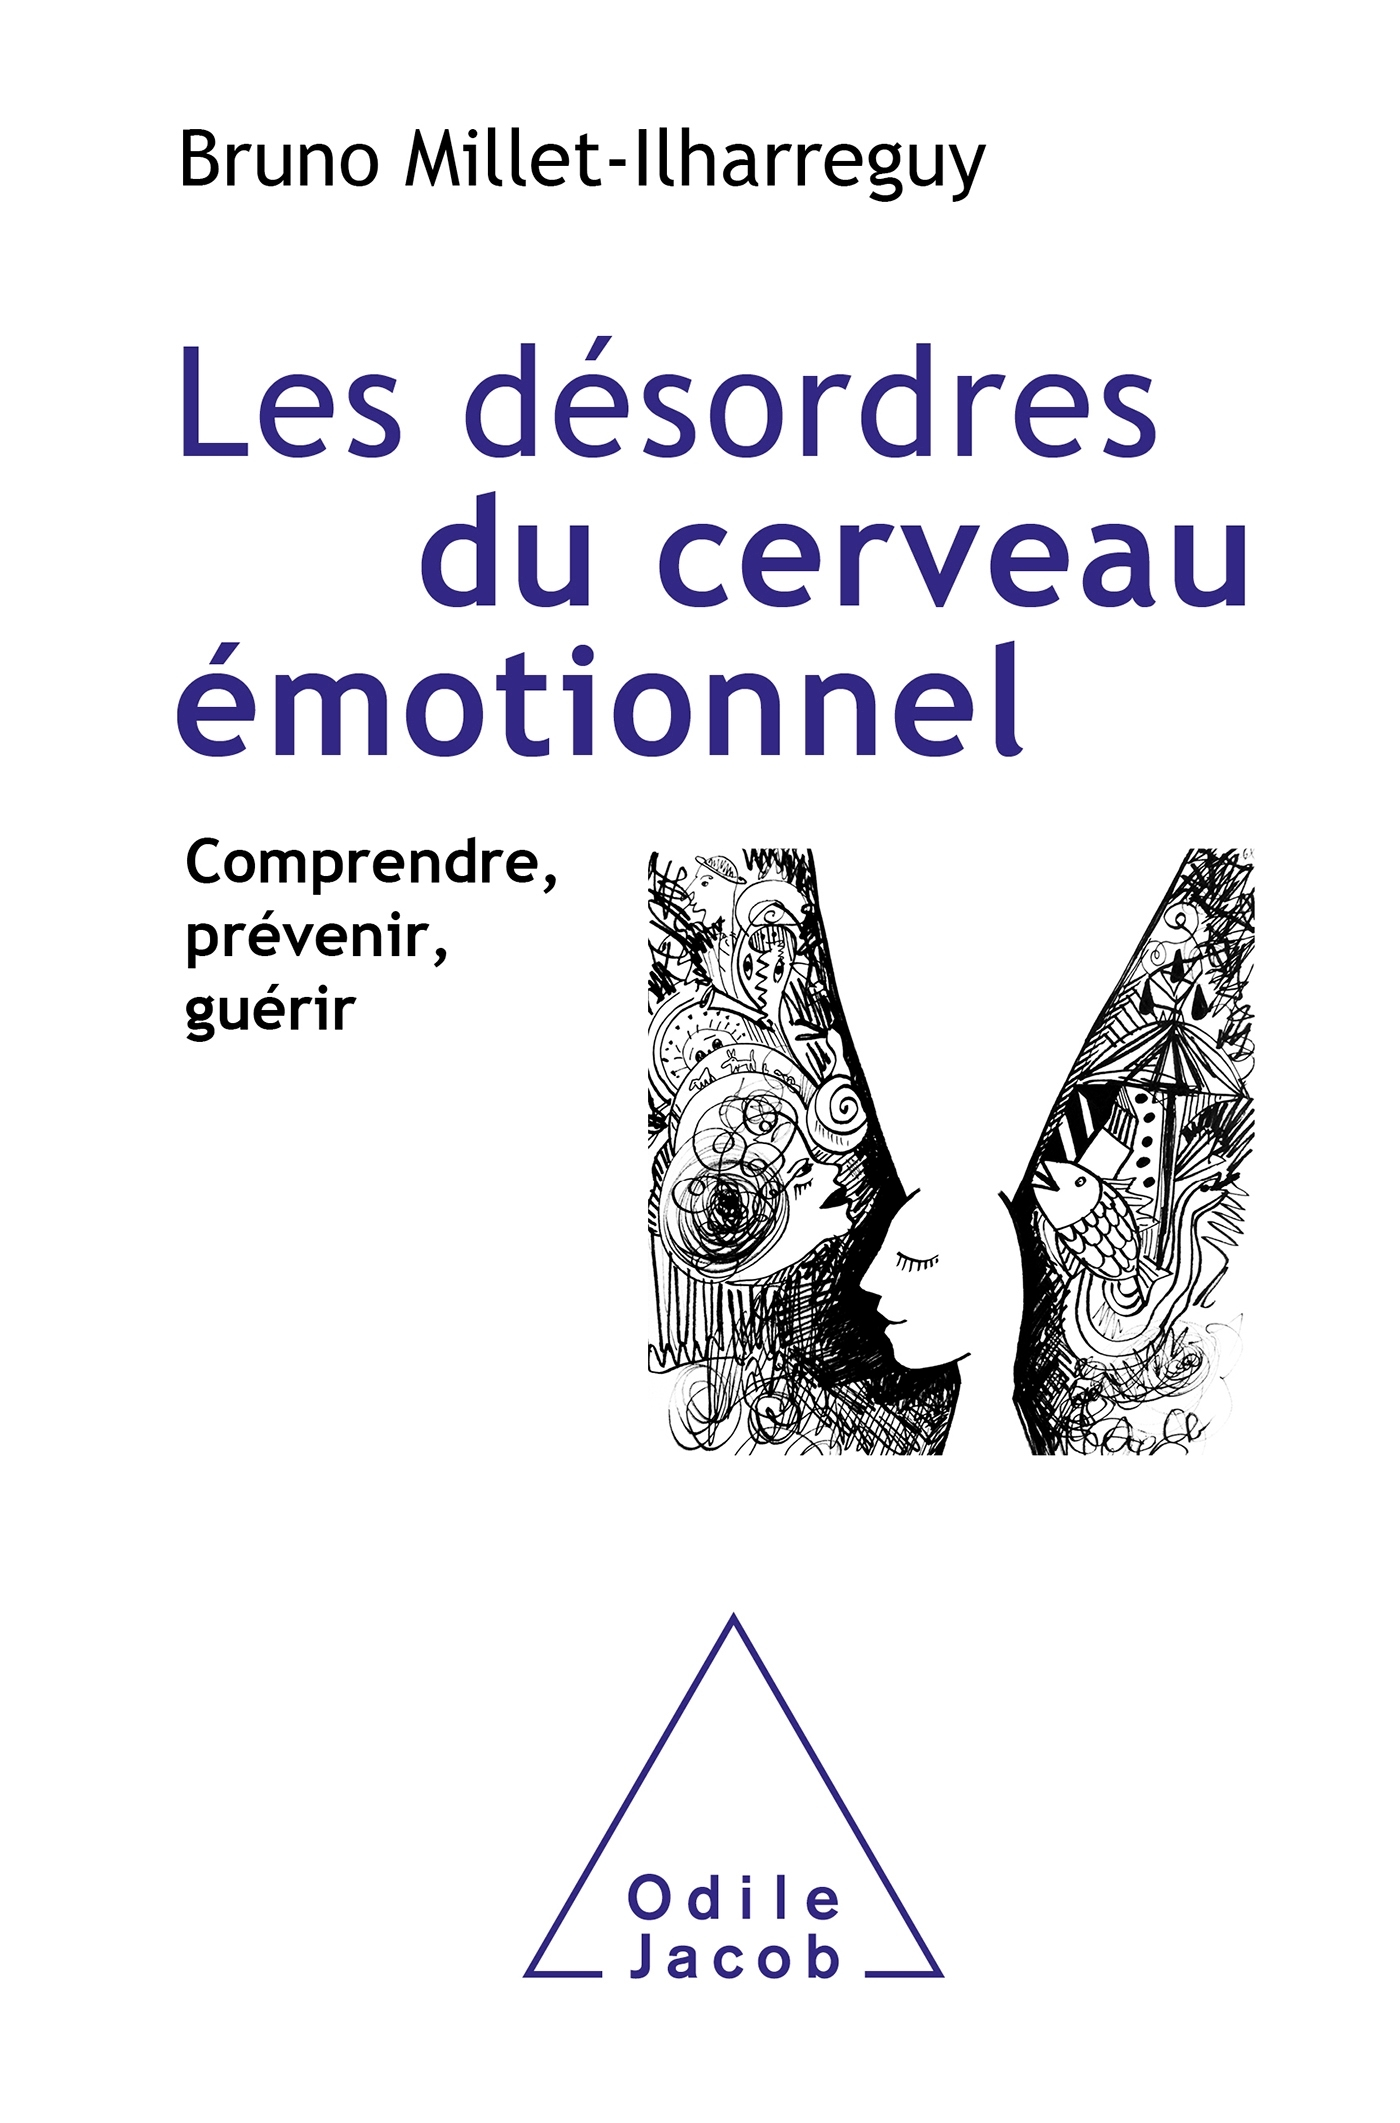 LES DESORDRES DU CERVEAU EMOTIONNEL - COMPRENDRE, PREVENIR, GUERIR